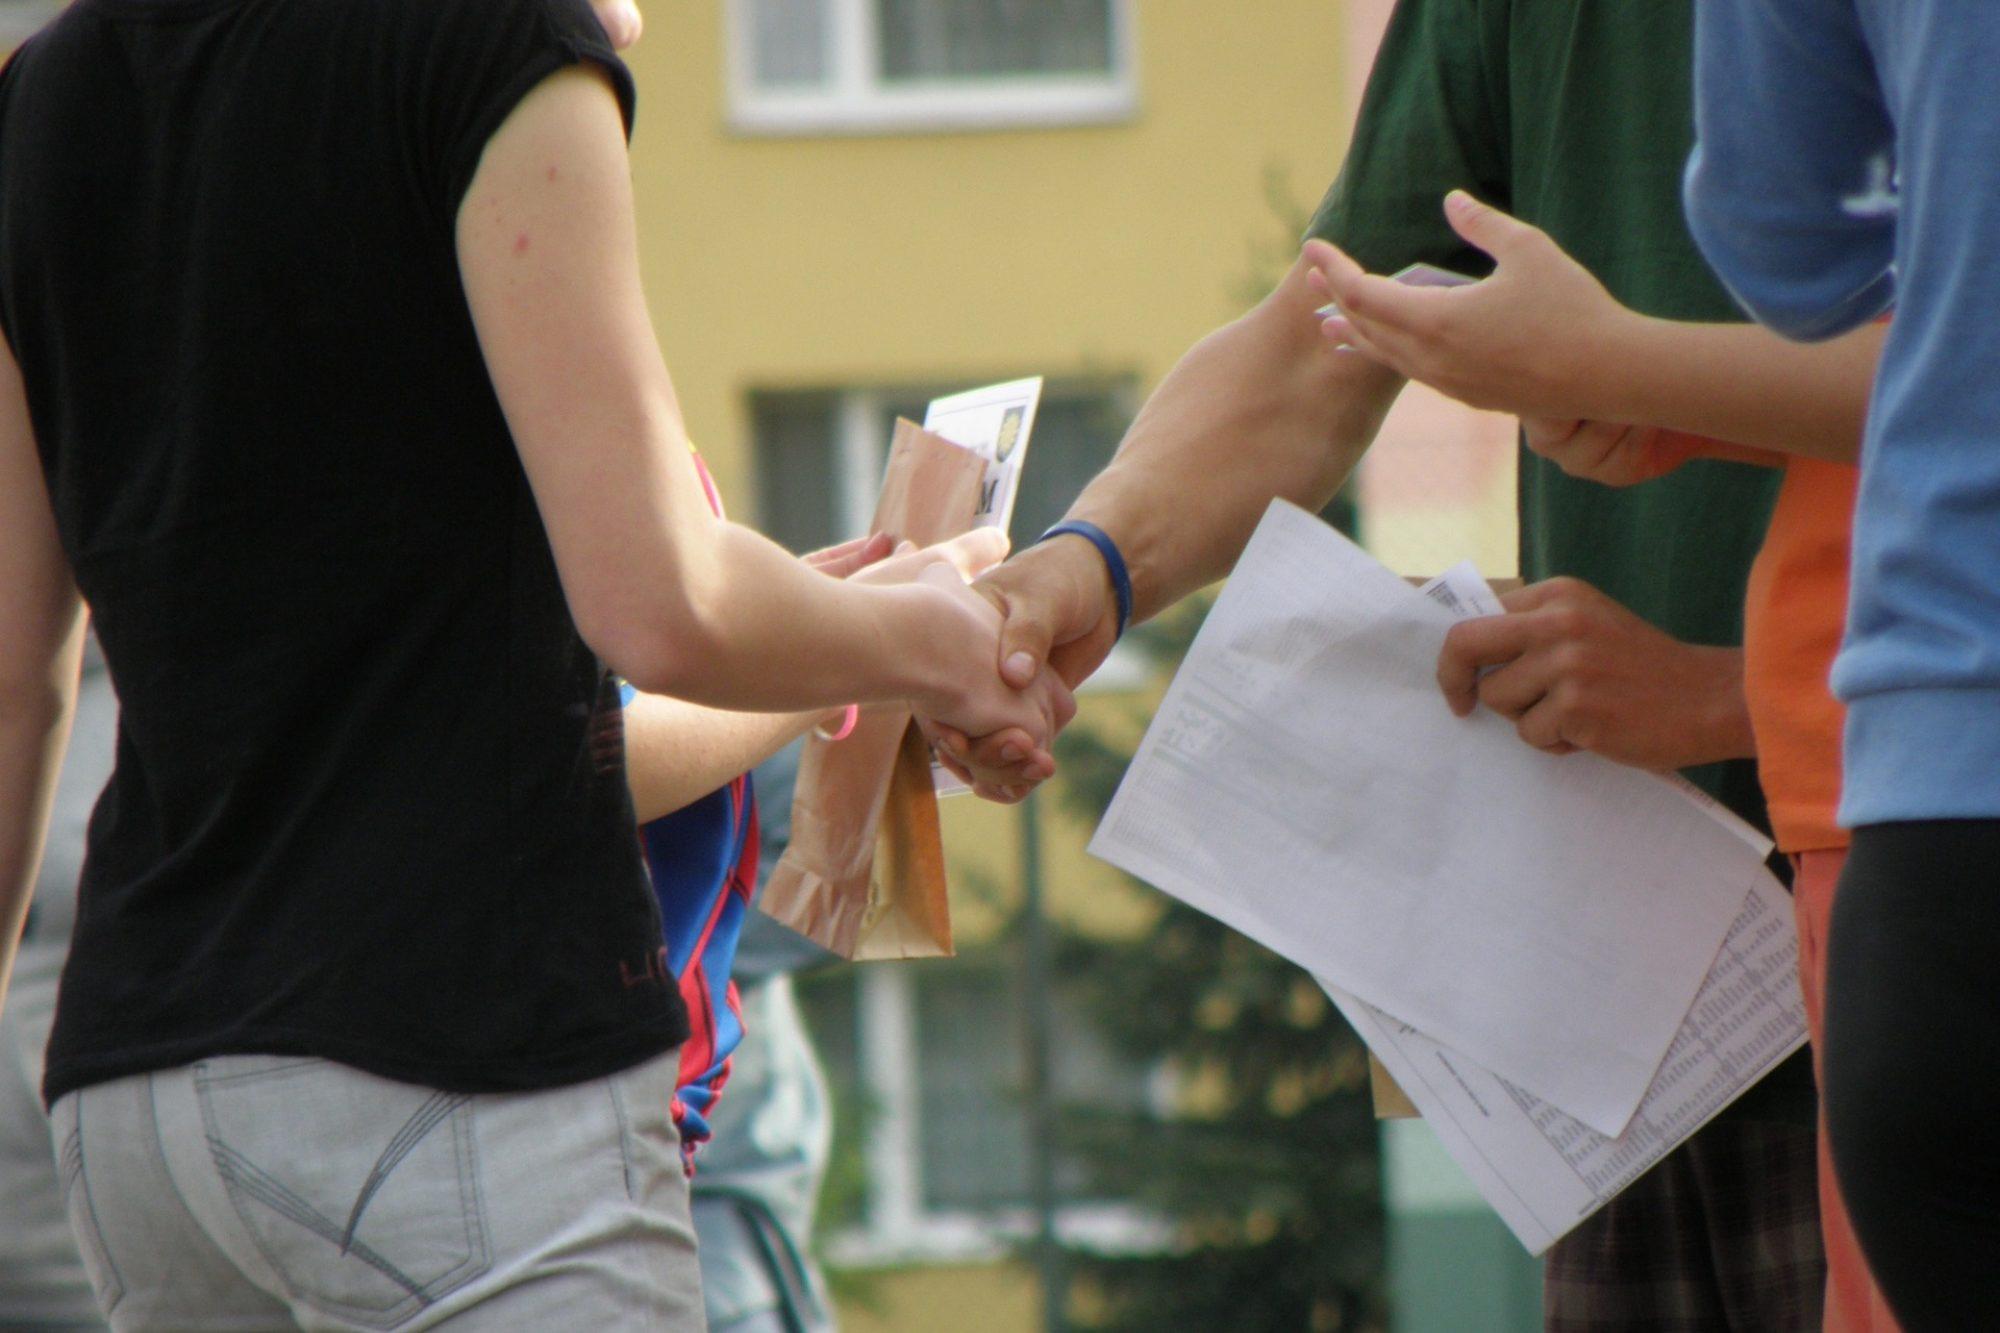 Handshakes 930178 1920 Pixabay